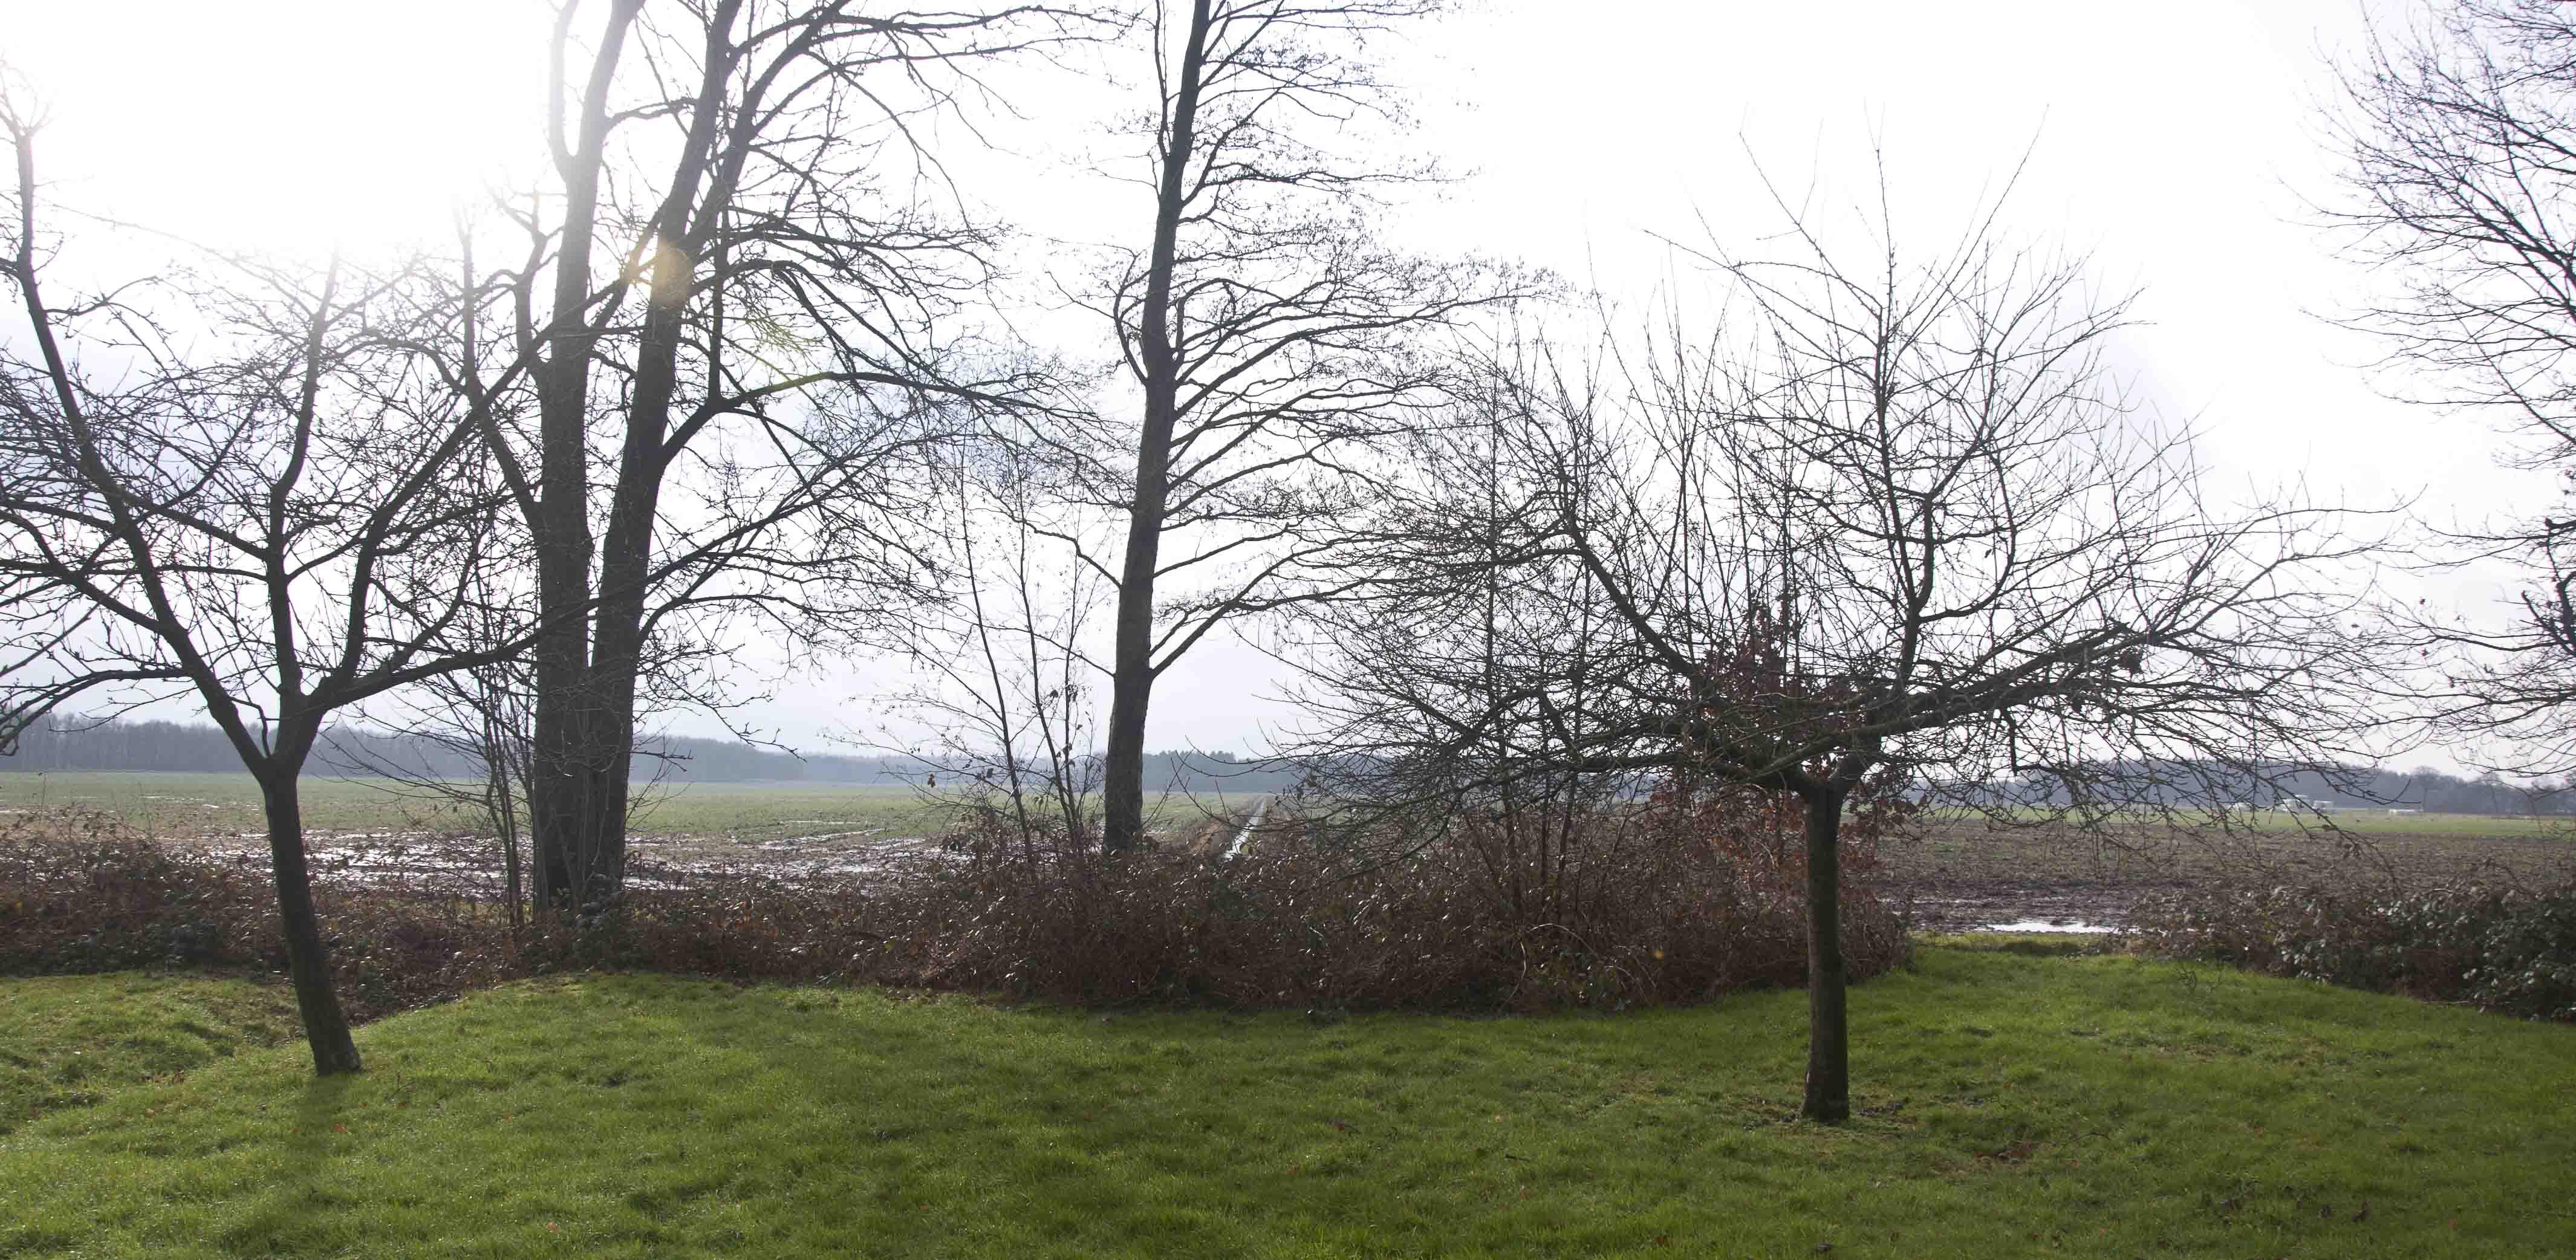 2015 02 21 HSB Wapserveen 5821